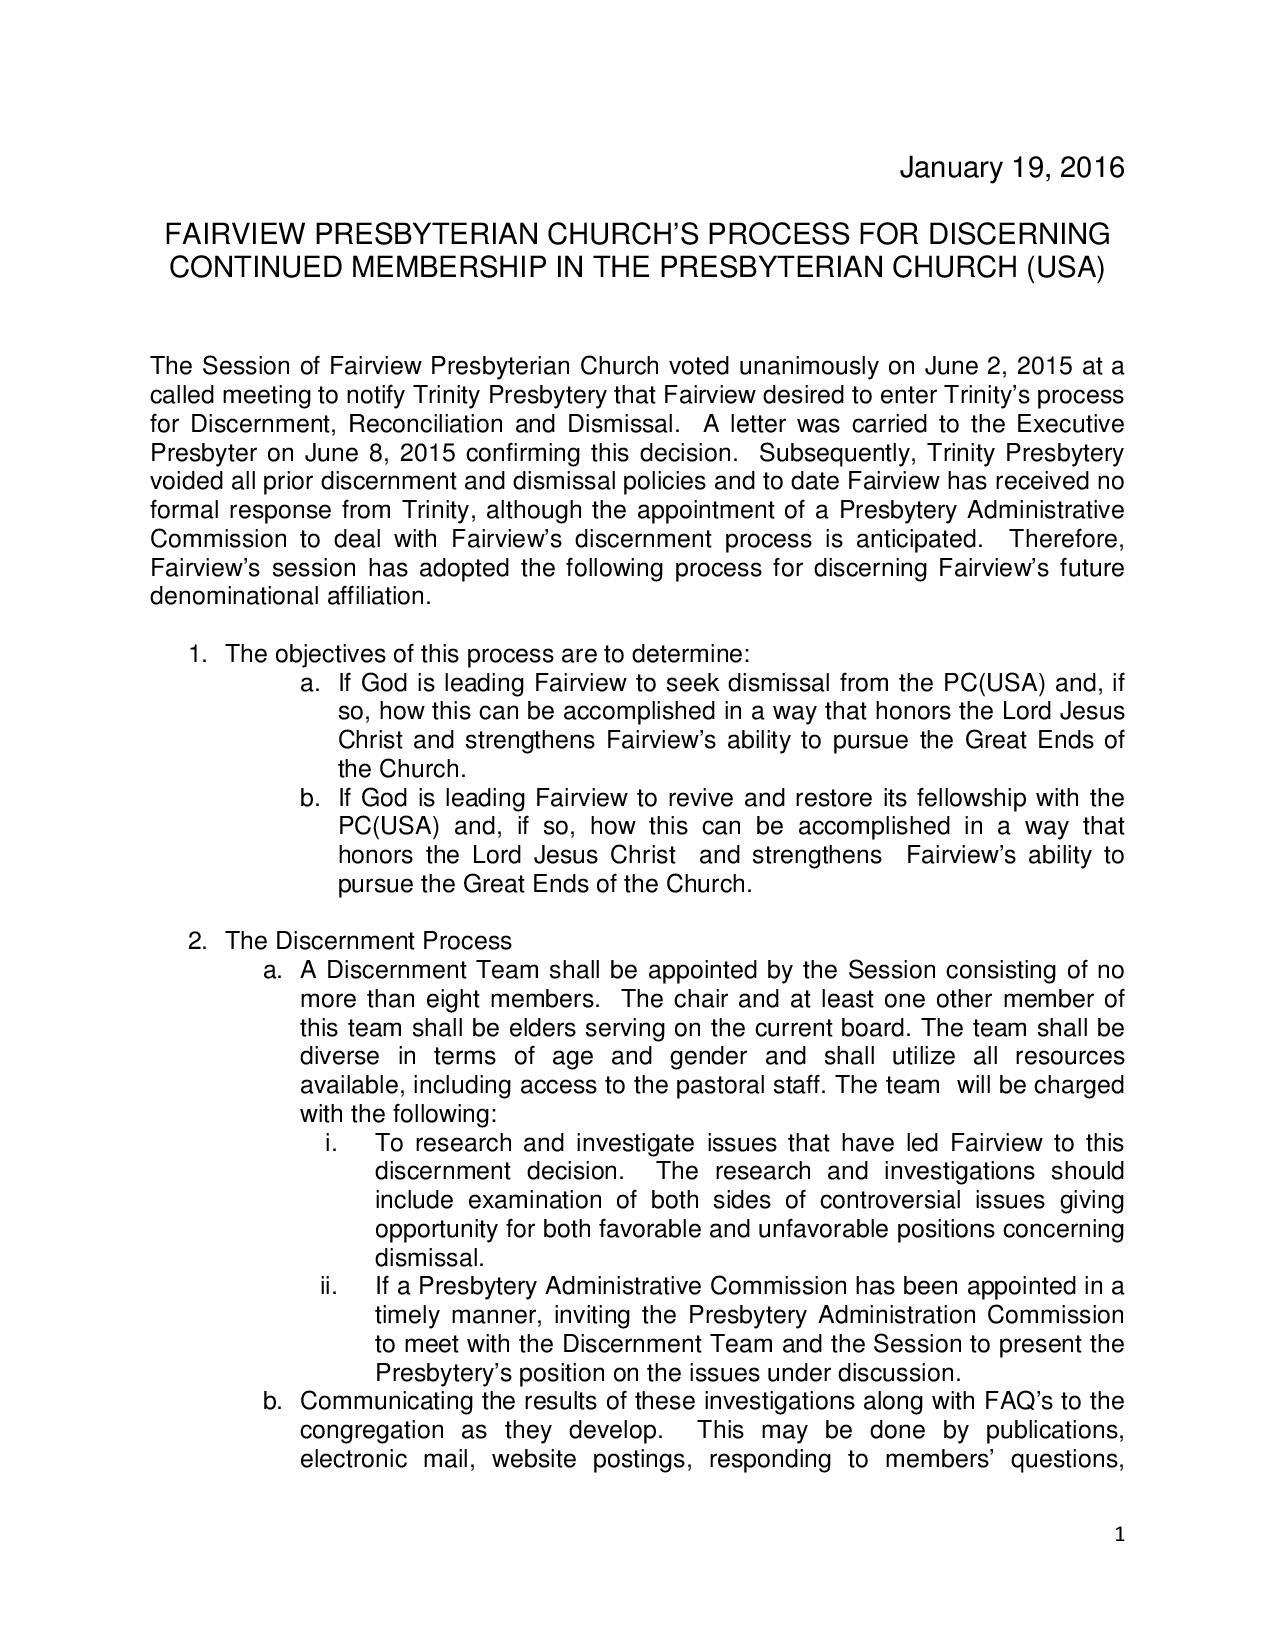 FAIRVIEW Discernment Process - Final-page-001.jpg